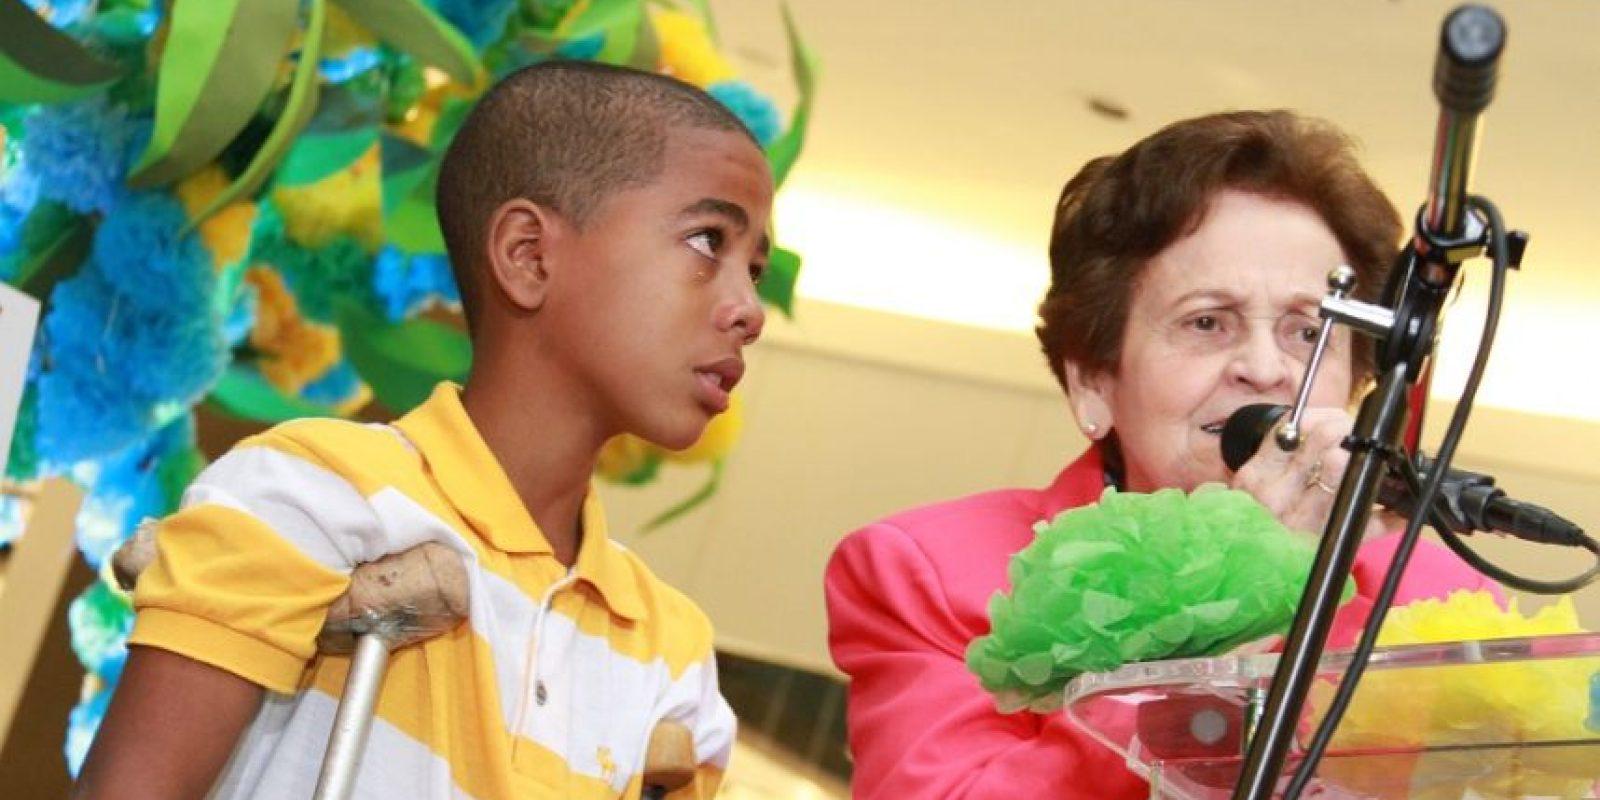 Mary Pérez de Marranzini junto a un niño que recibe ayuda en Rehabilitación. Foto:Fuente externa